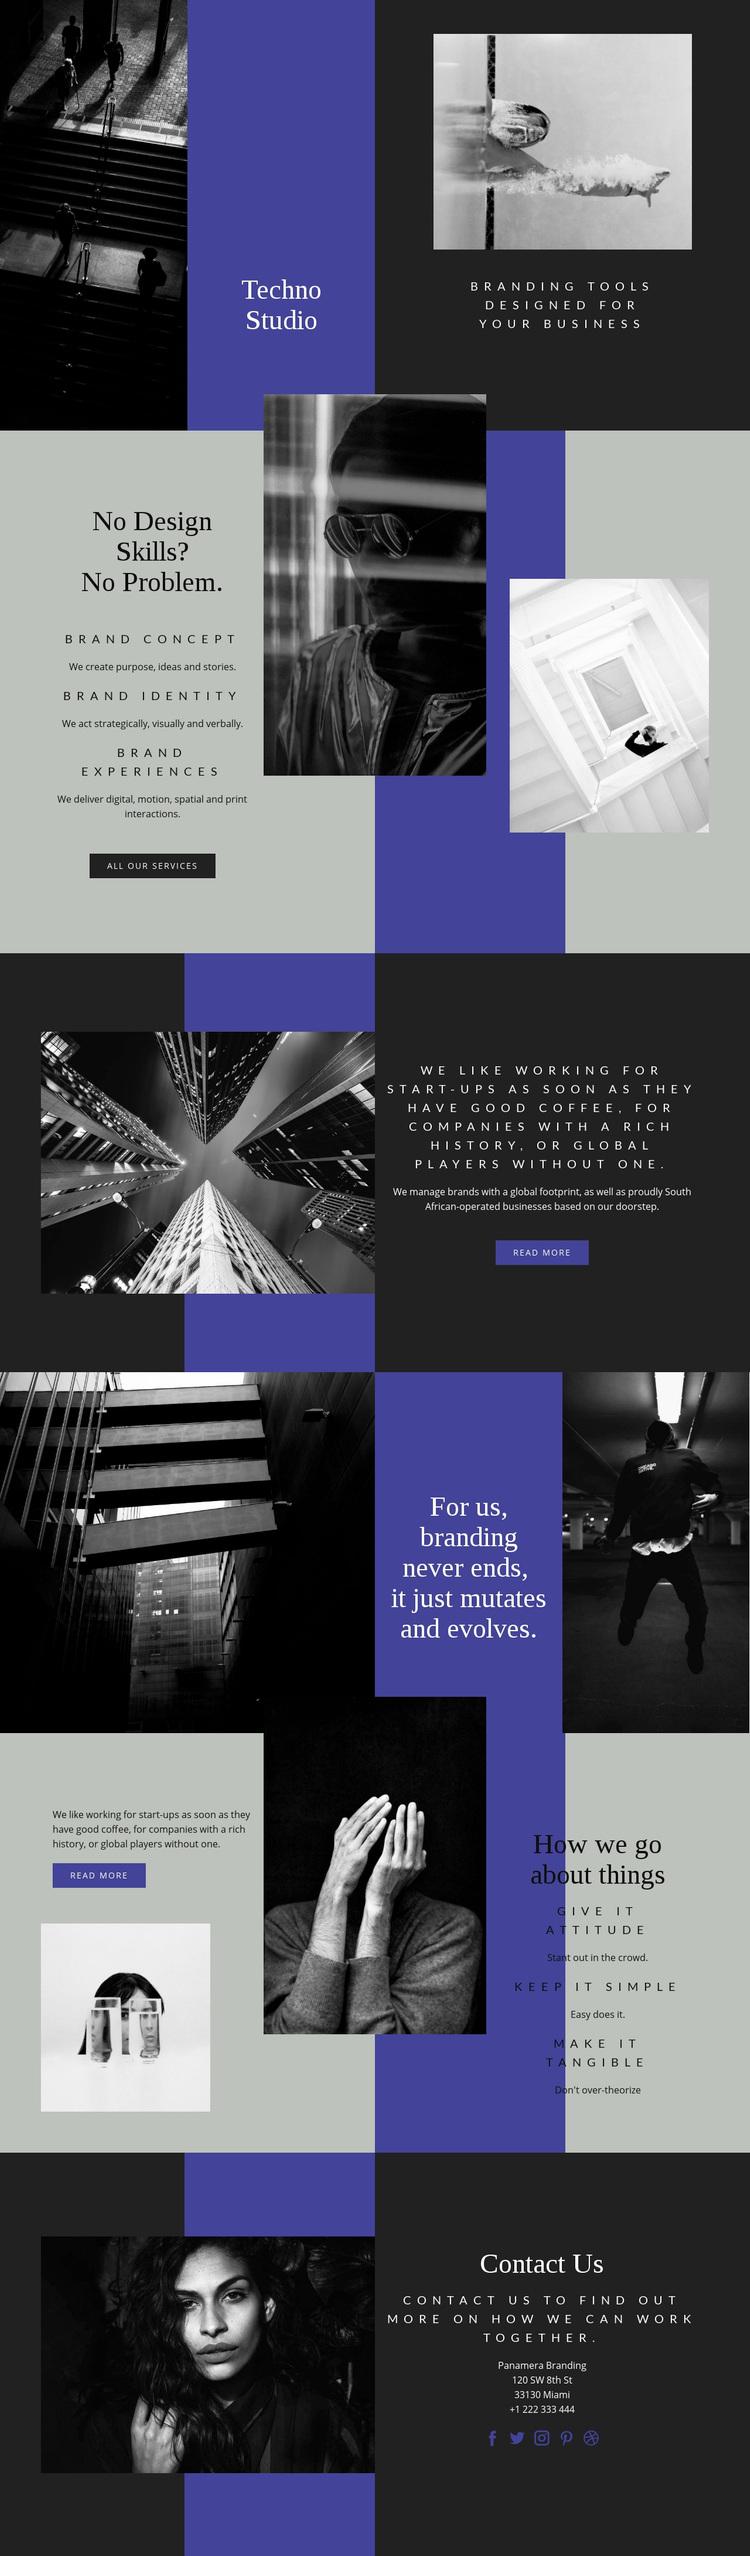 Techno skills in business Web Page Designer